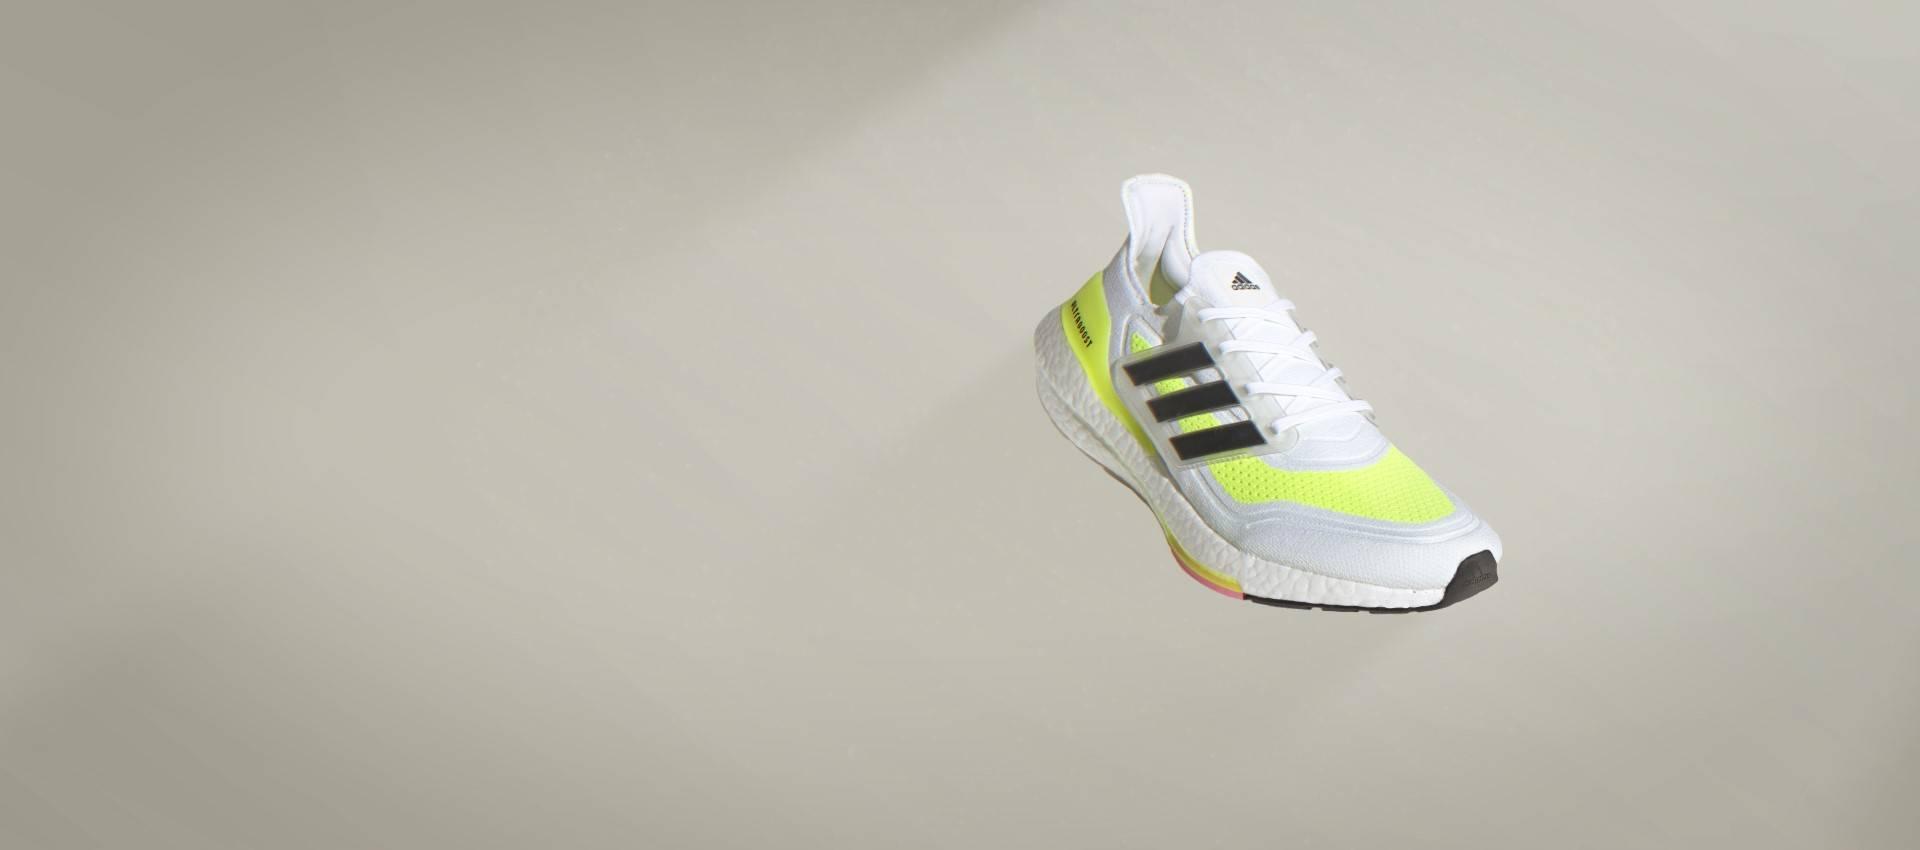 Zapatillas Adidas Ultraboost 21